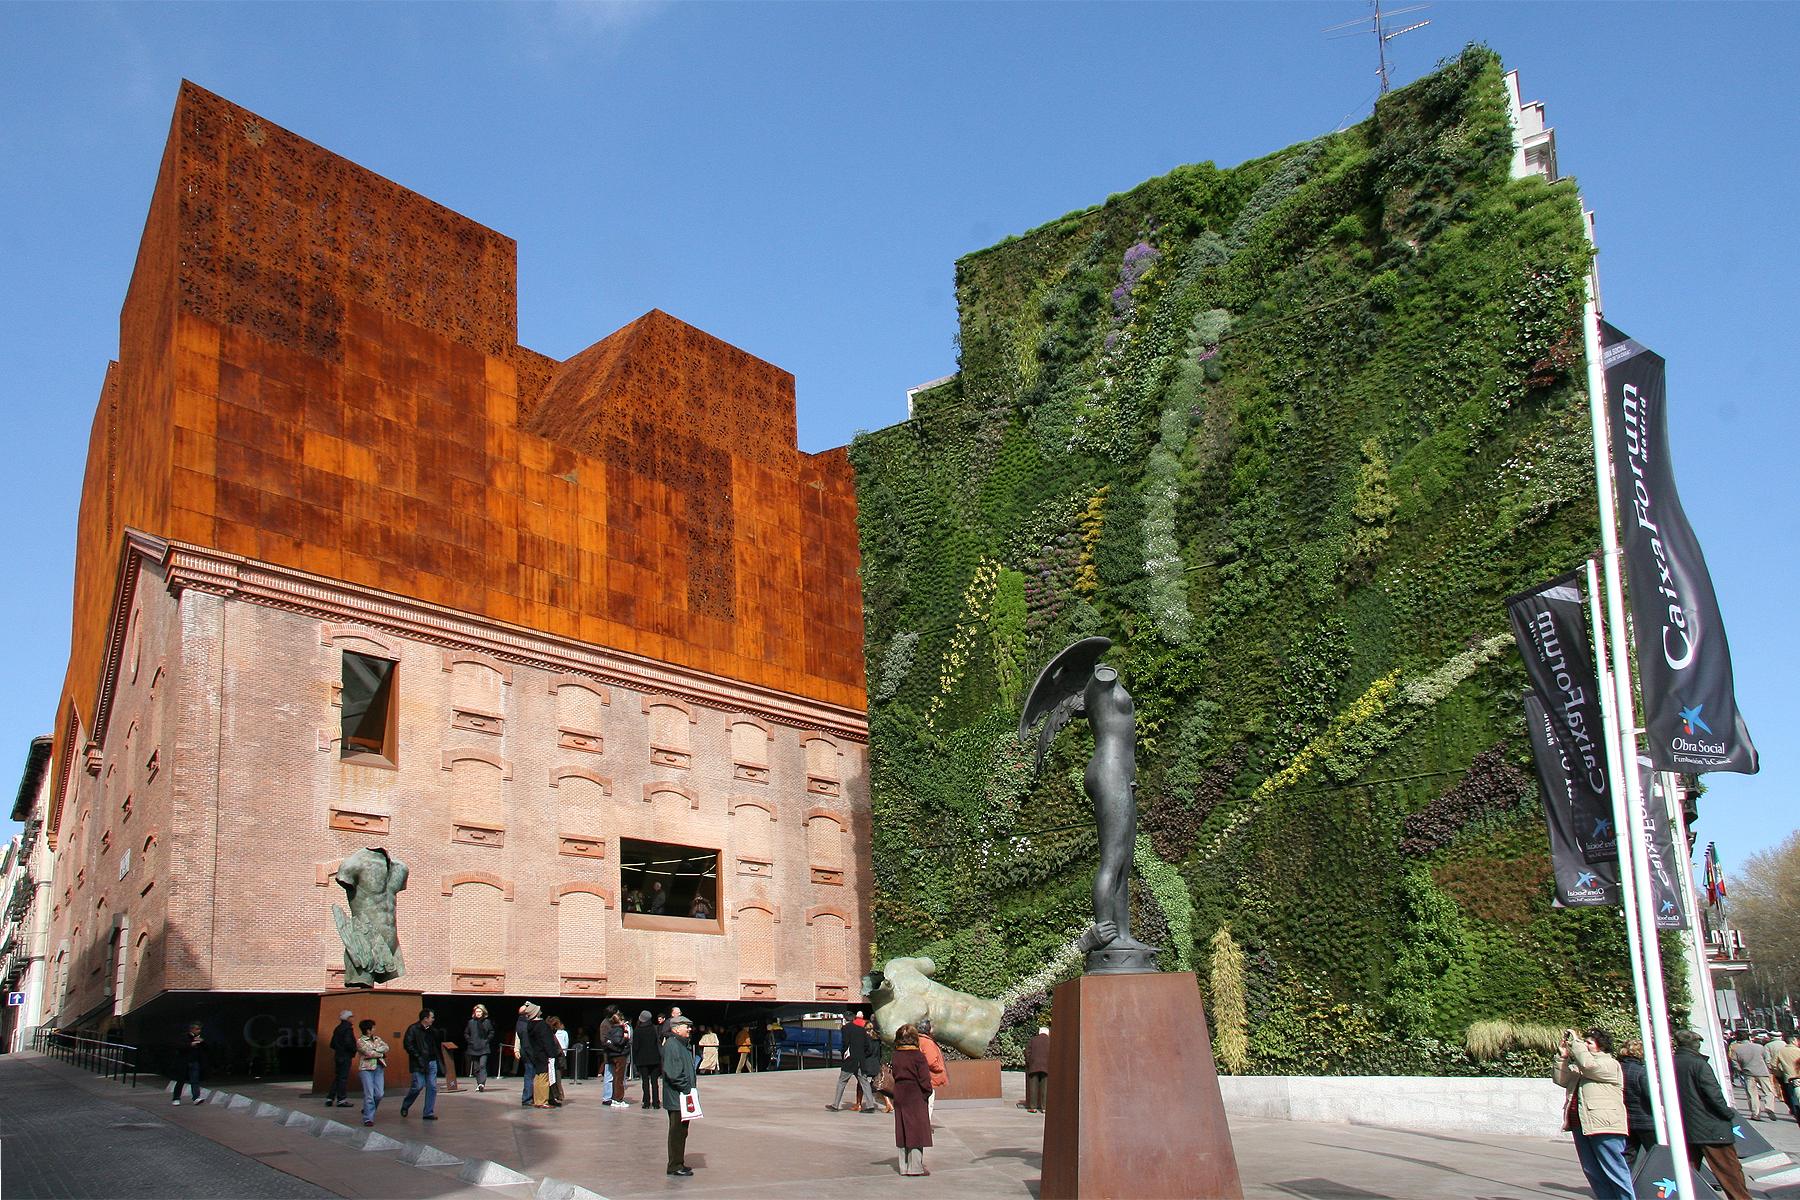 Caixa forum art exhibition madrid flickr photo sharing for Reformas de fachadas en palma